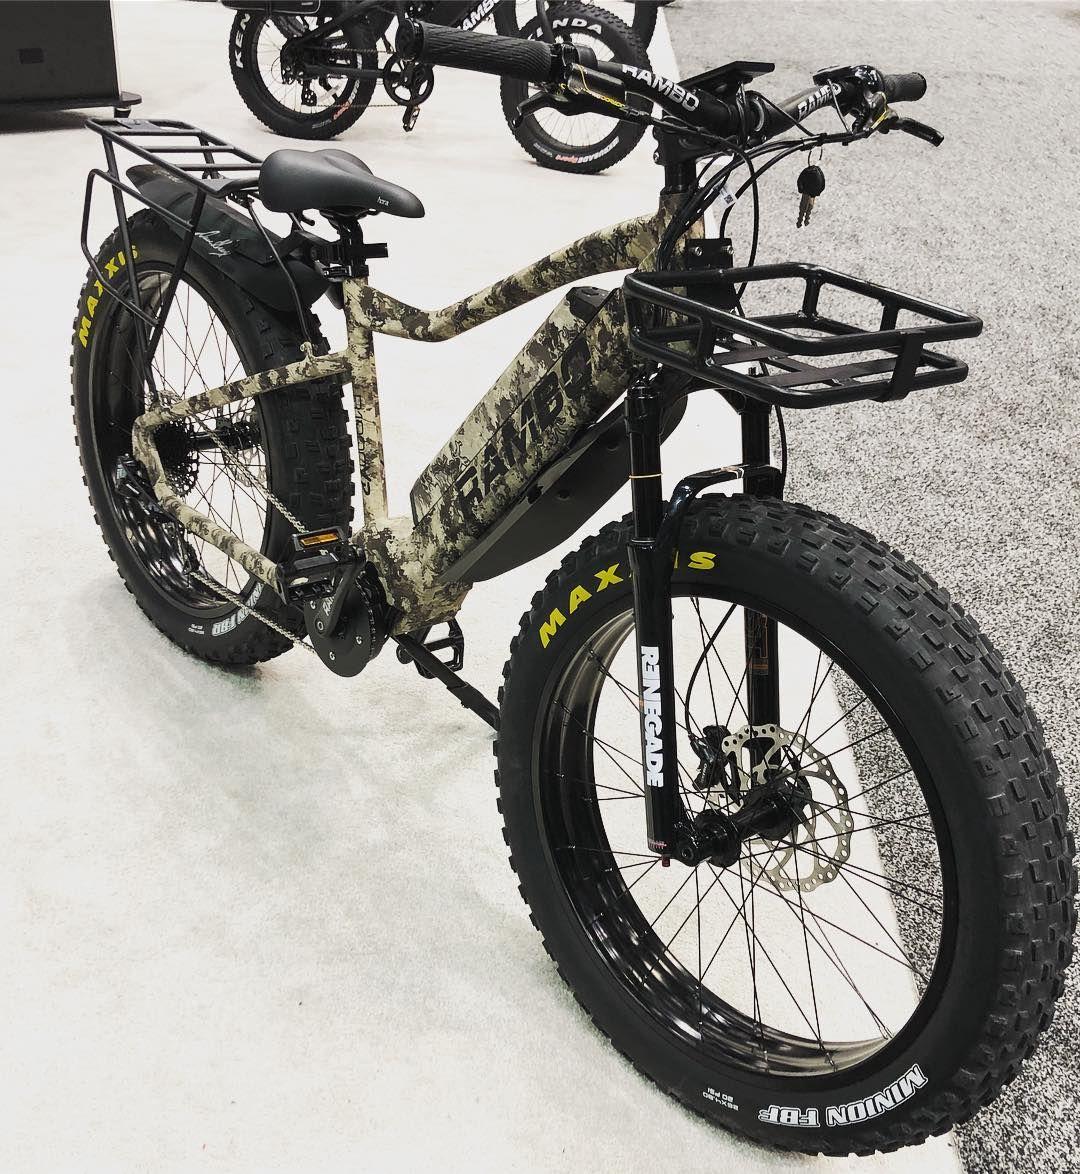 Rambo Electric Mountain Bikes Arrive April 2018 Evnerds Best Electric Bikes Electric Mountain Bike Electric Bike